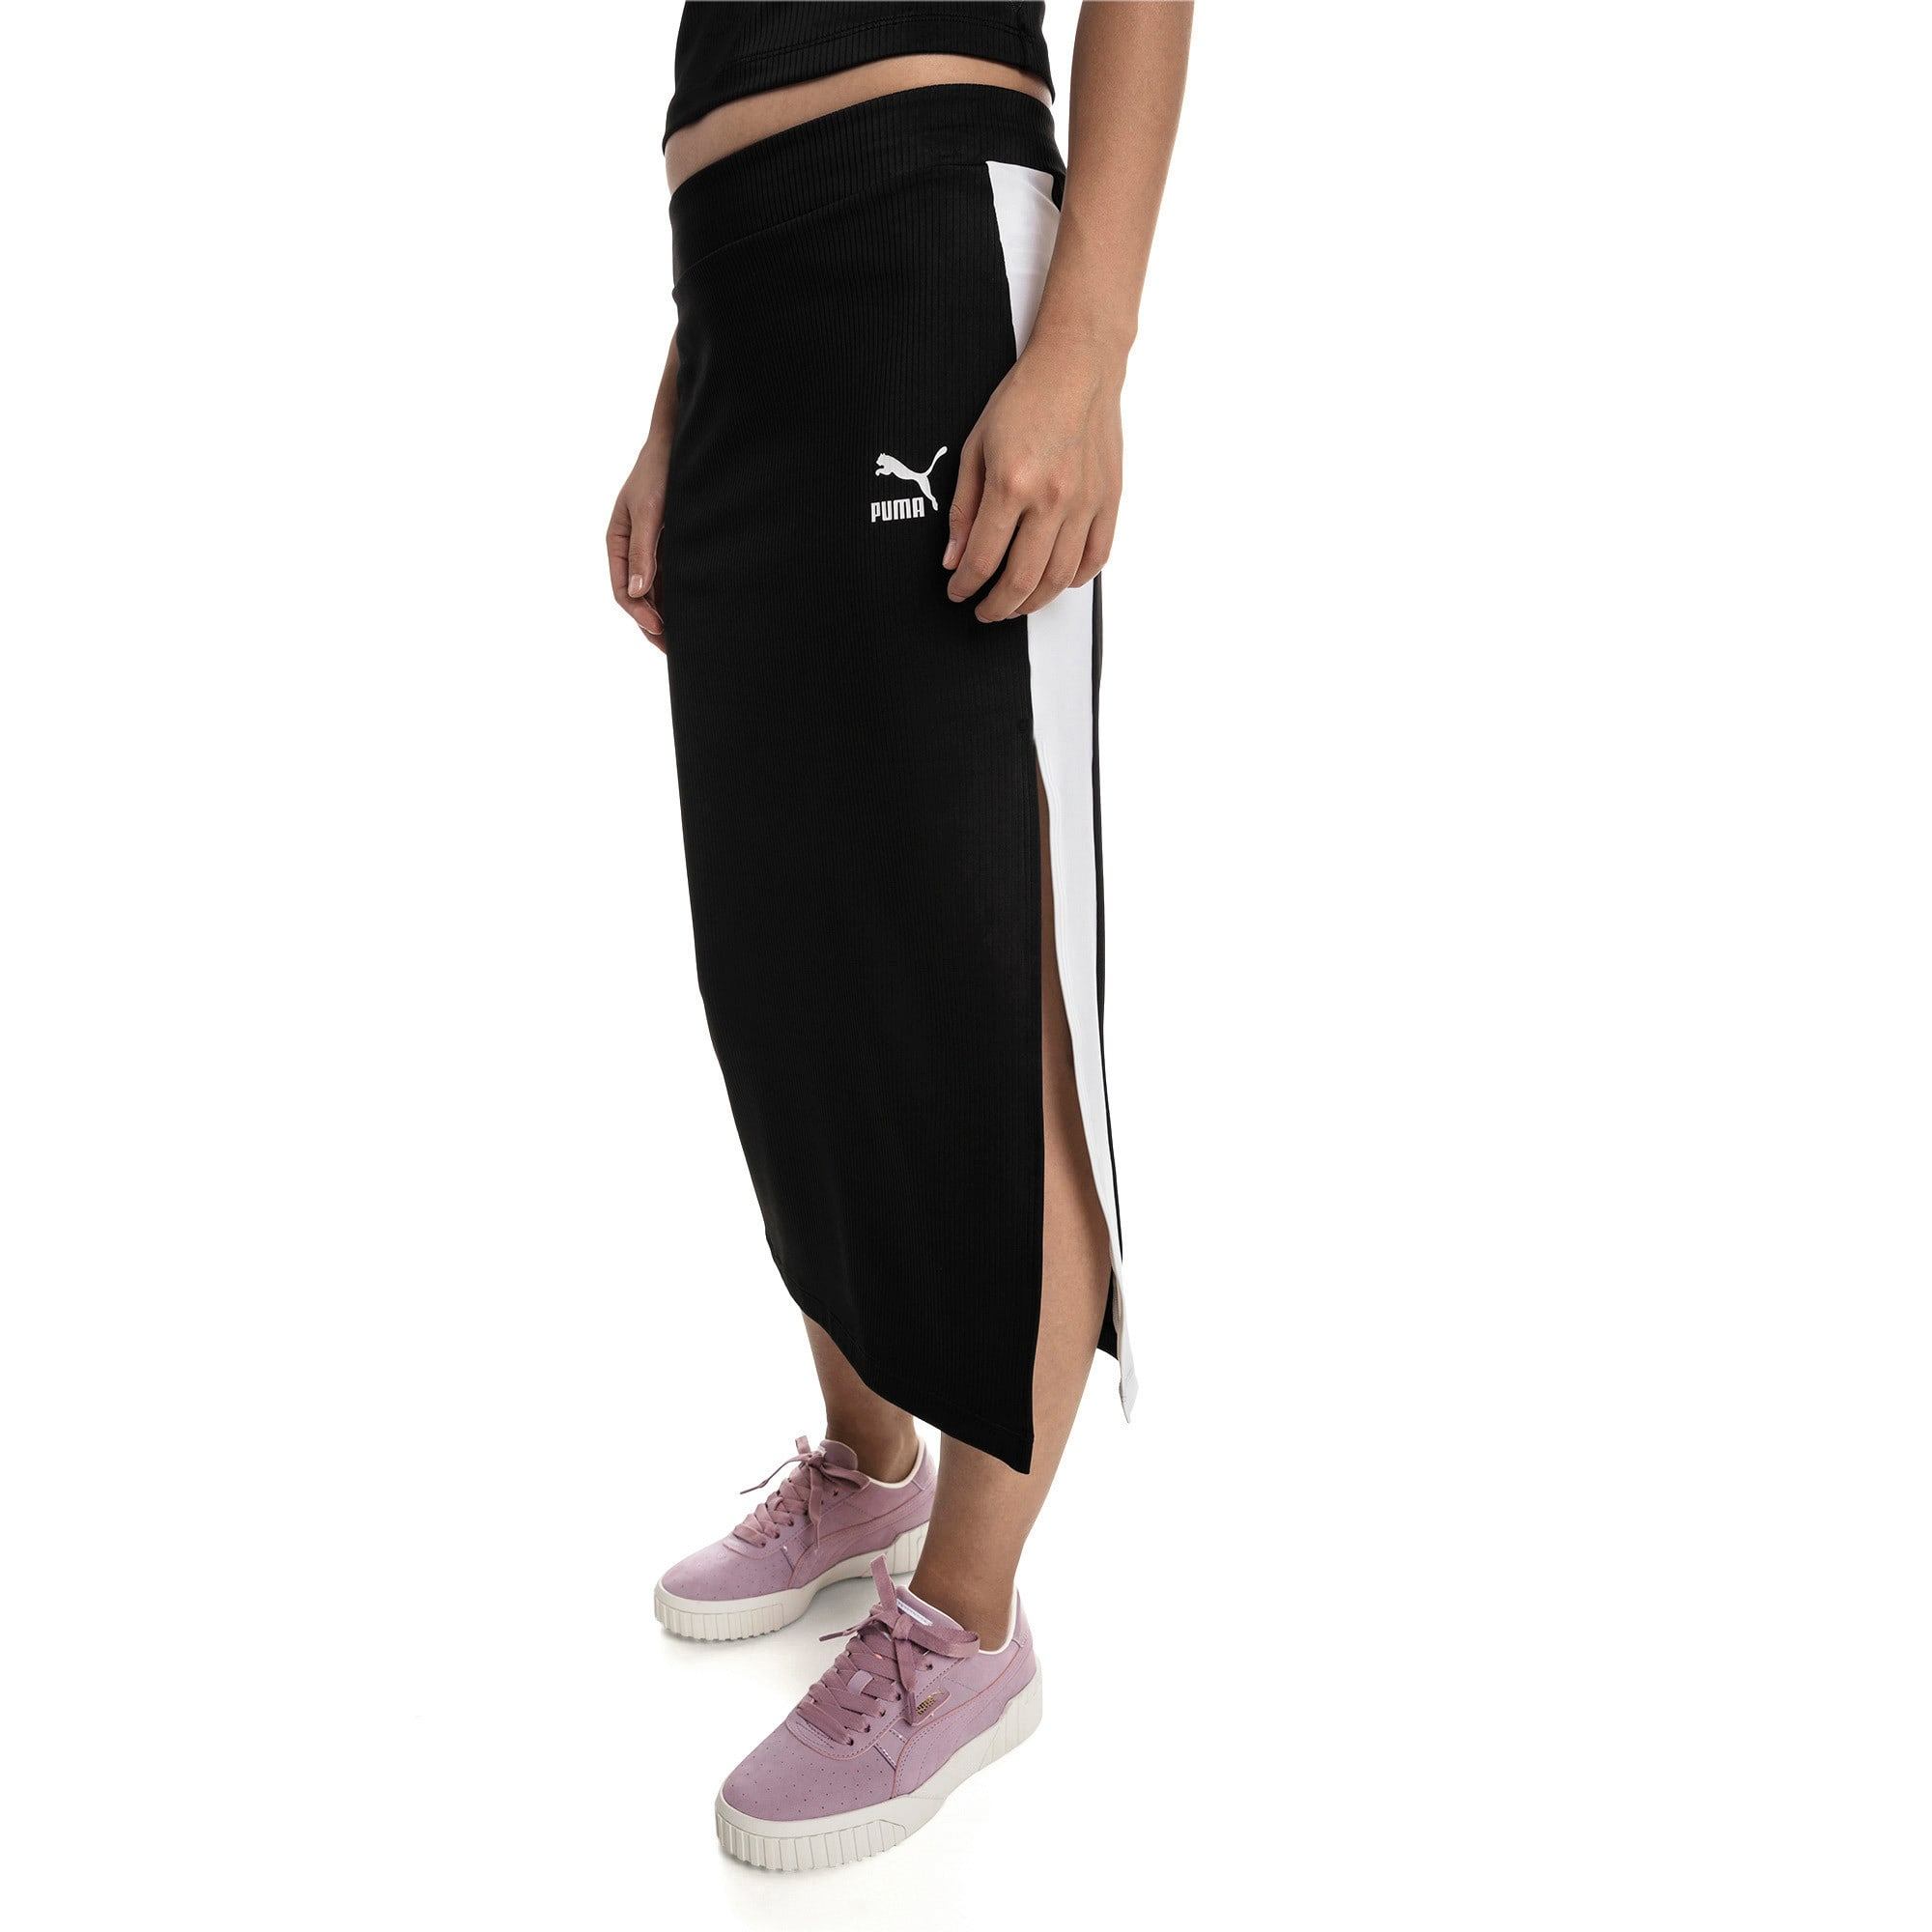 Thumbnail 1 of Classics Women's Skirt, Puma Black, medium